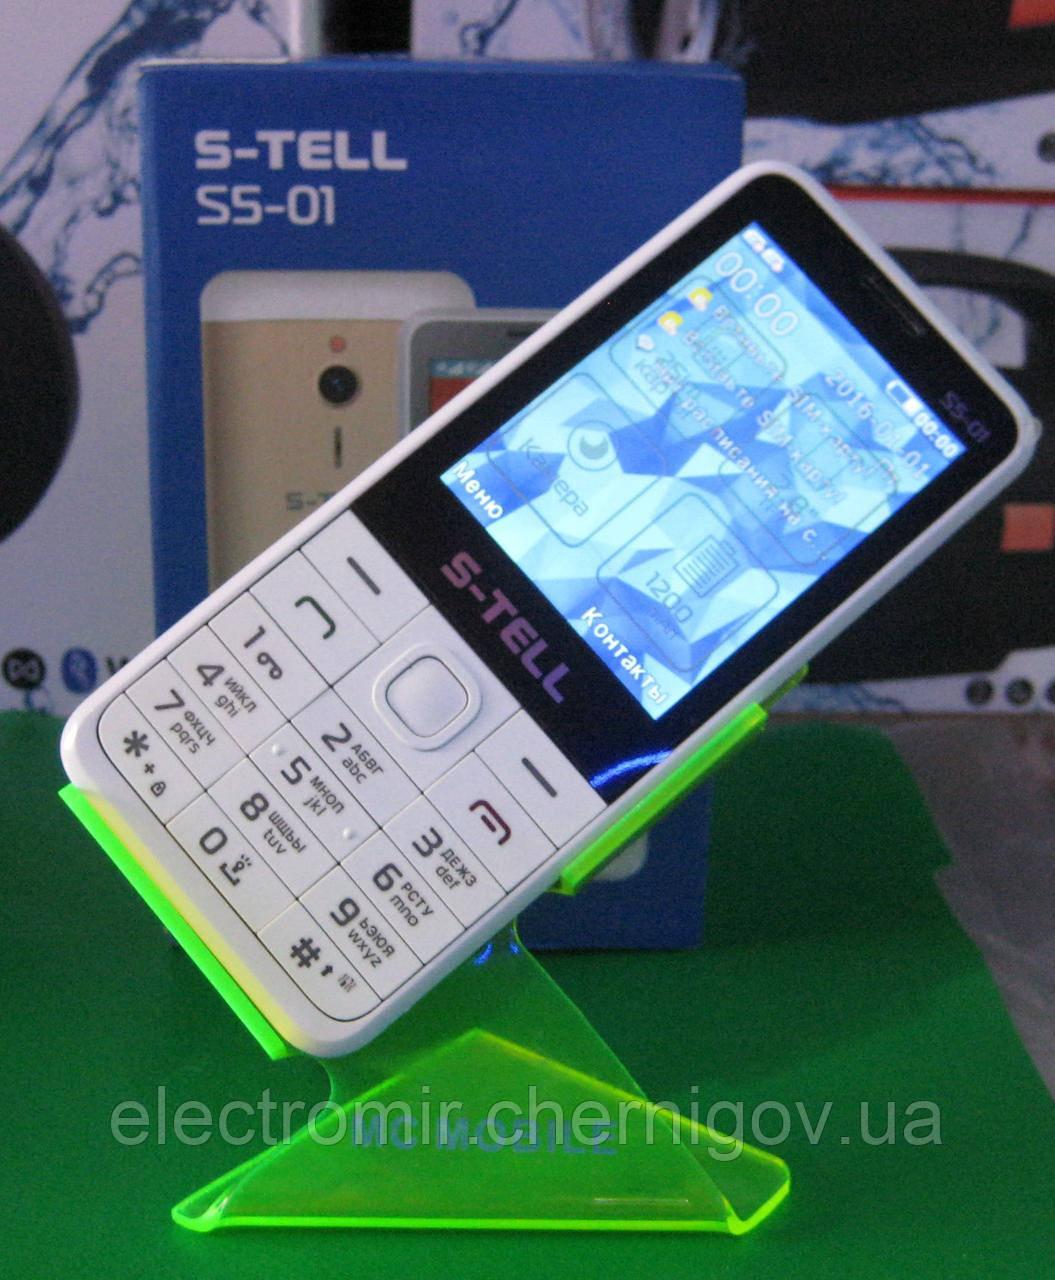 610f3b9171c6a Мобильный телефон S-Tell S5-01 (White), цена 520 грн., купить в ...